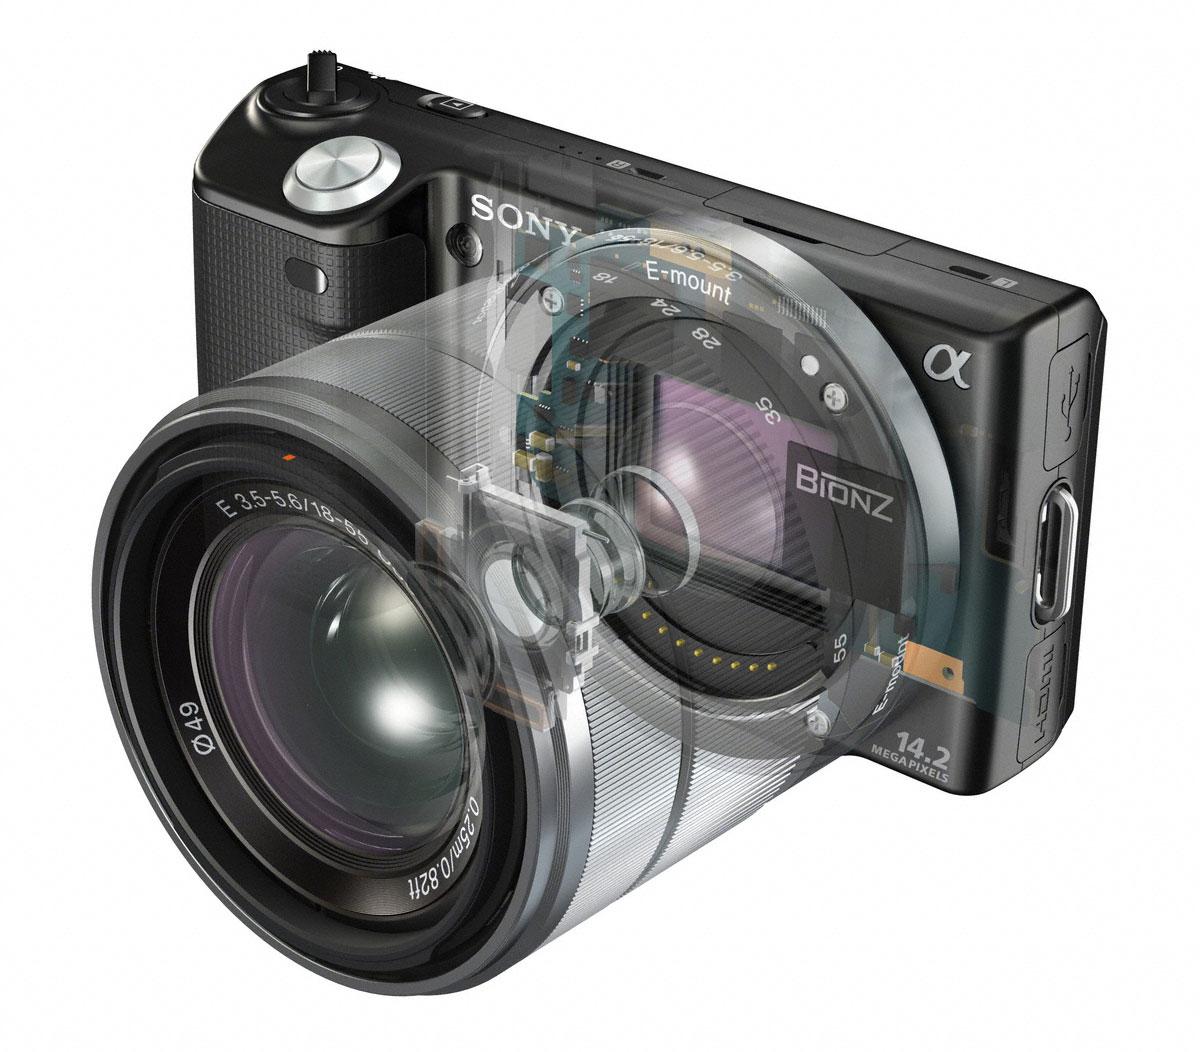 Sony Alpha NEX-5N Mirrorless First Look Review